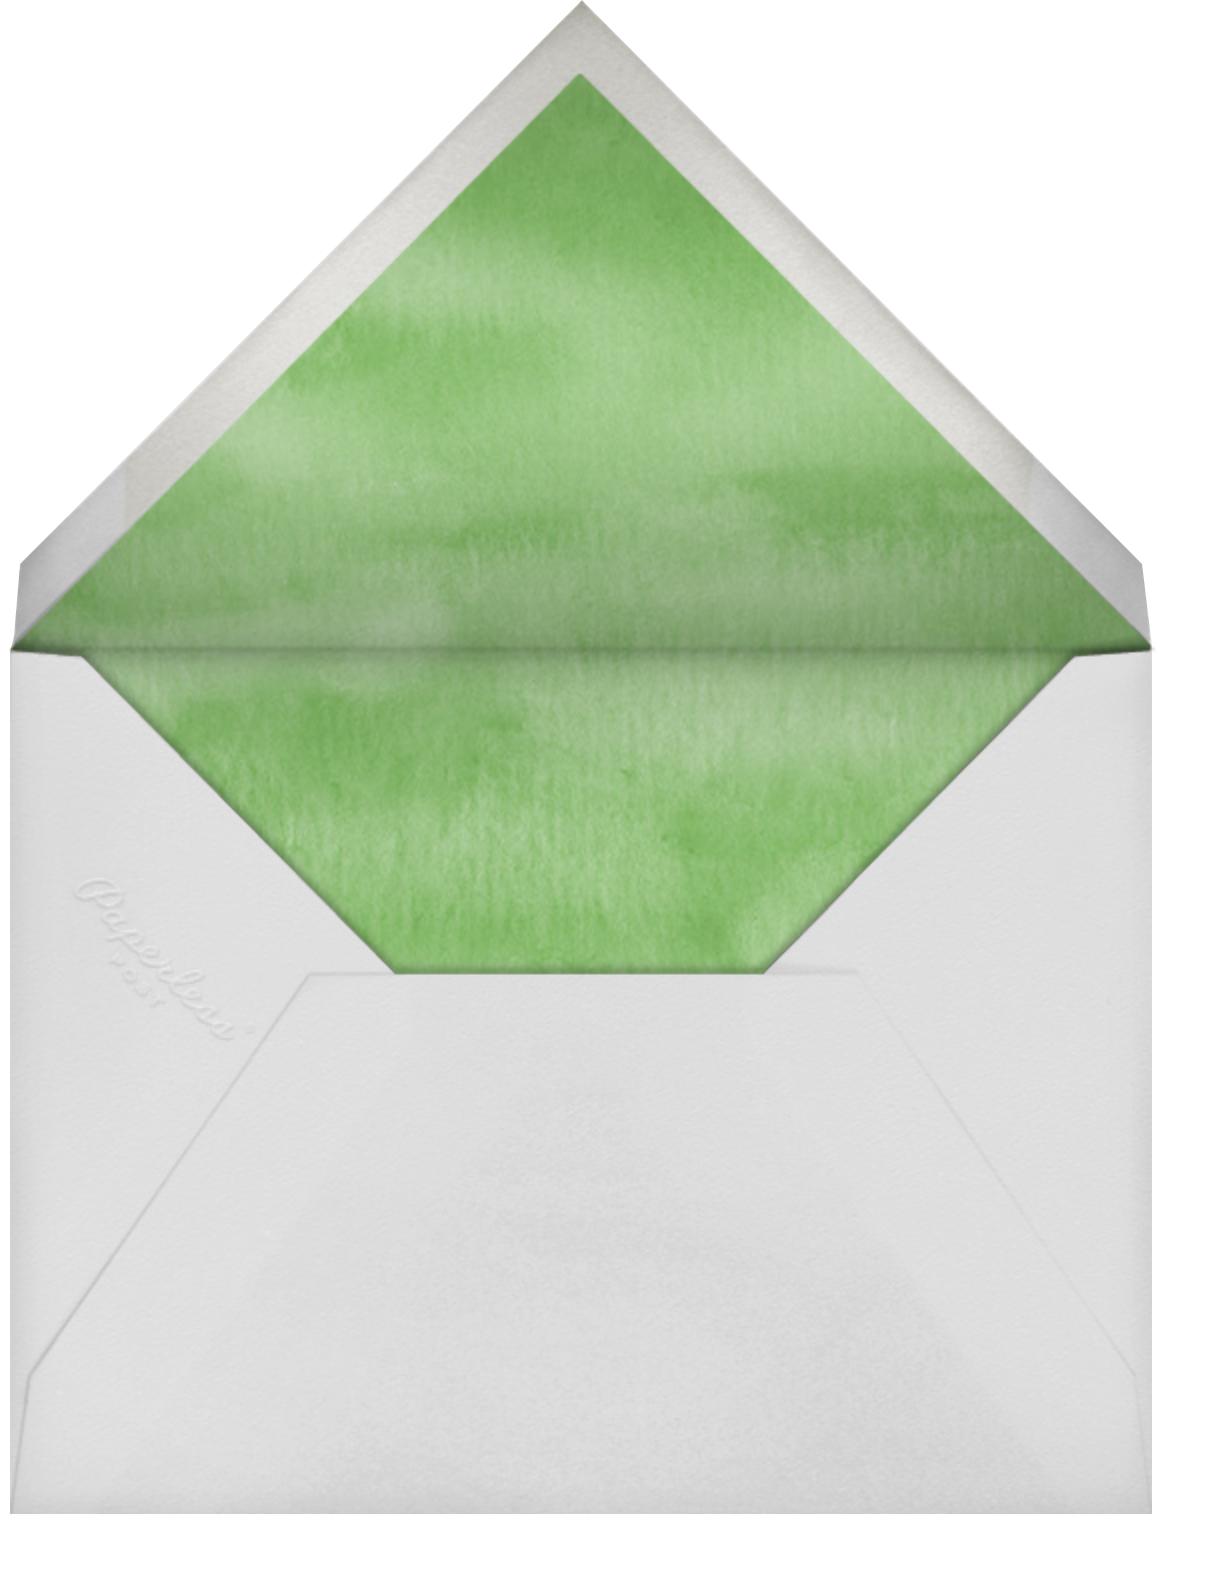 Naiad - Felix Doolittle - Save the date - envelope back